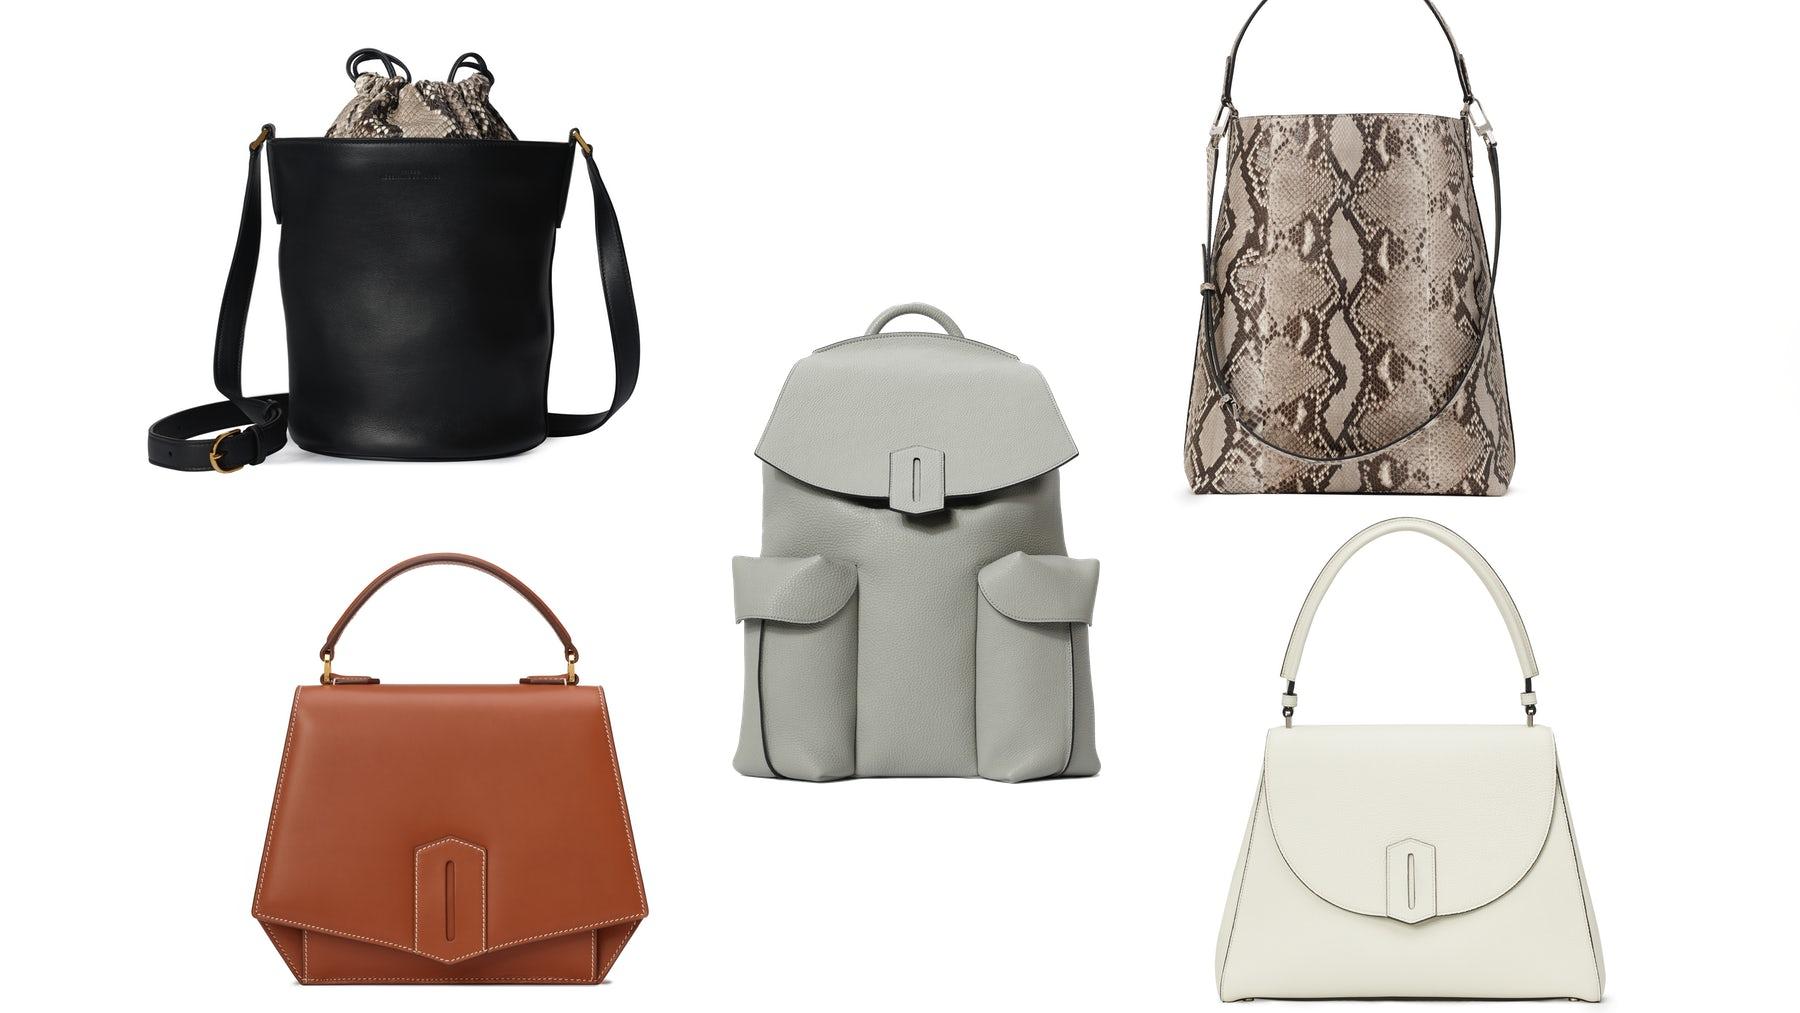 Byredo's new handbag line   Source: Courtesy